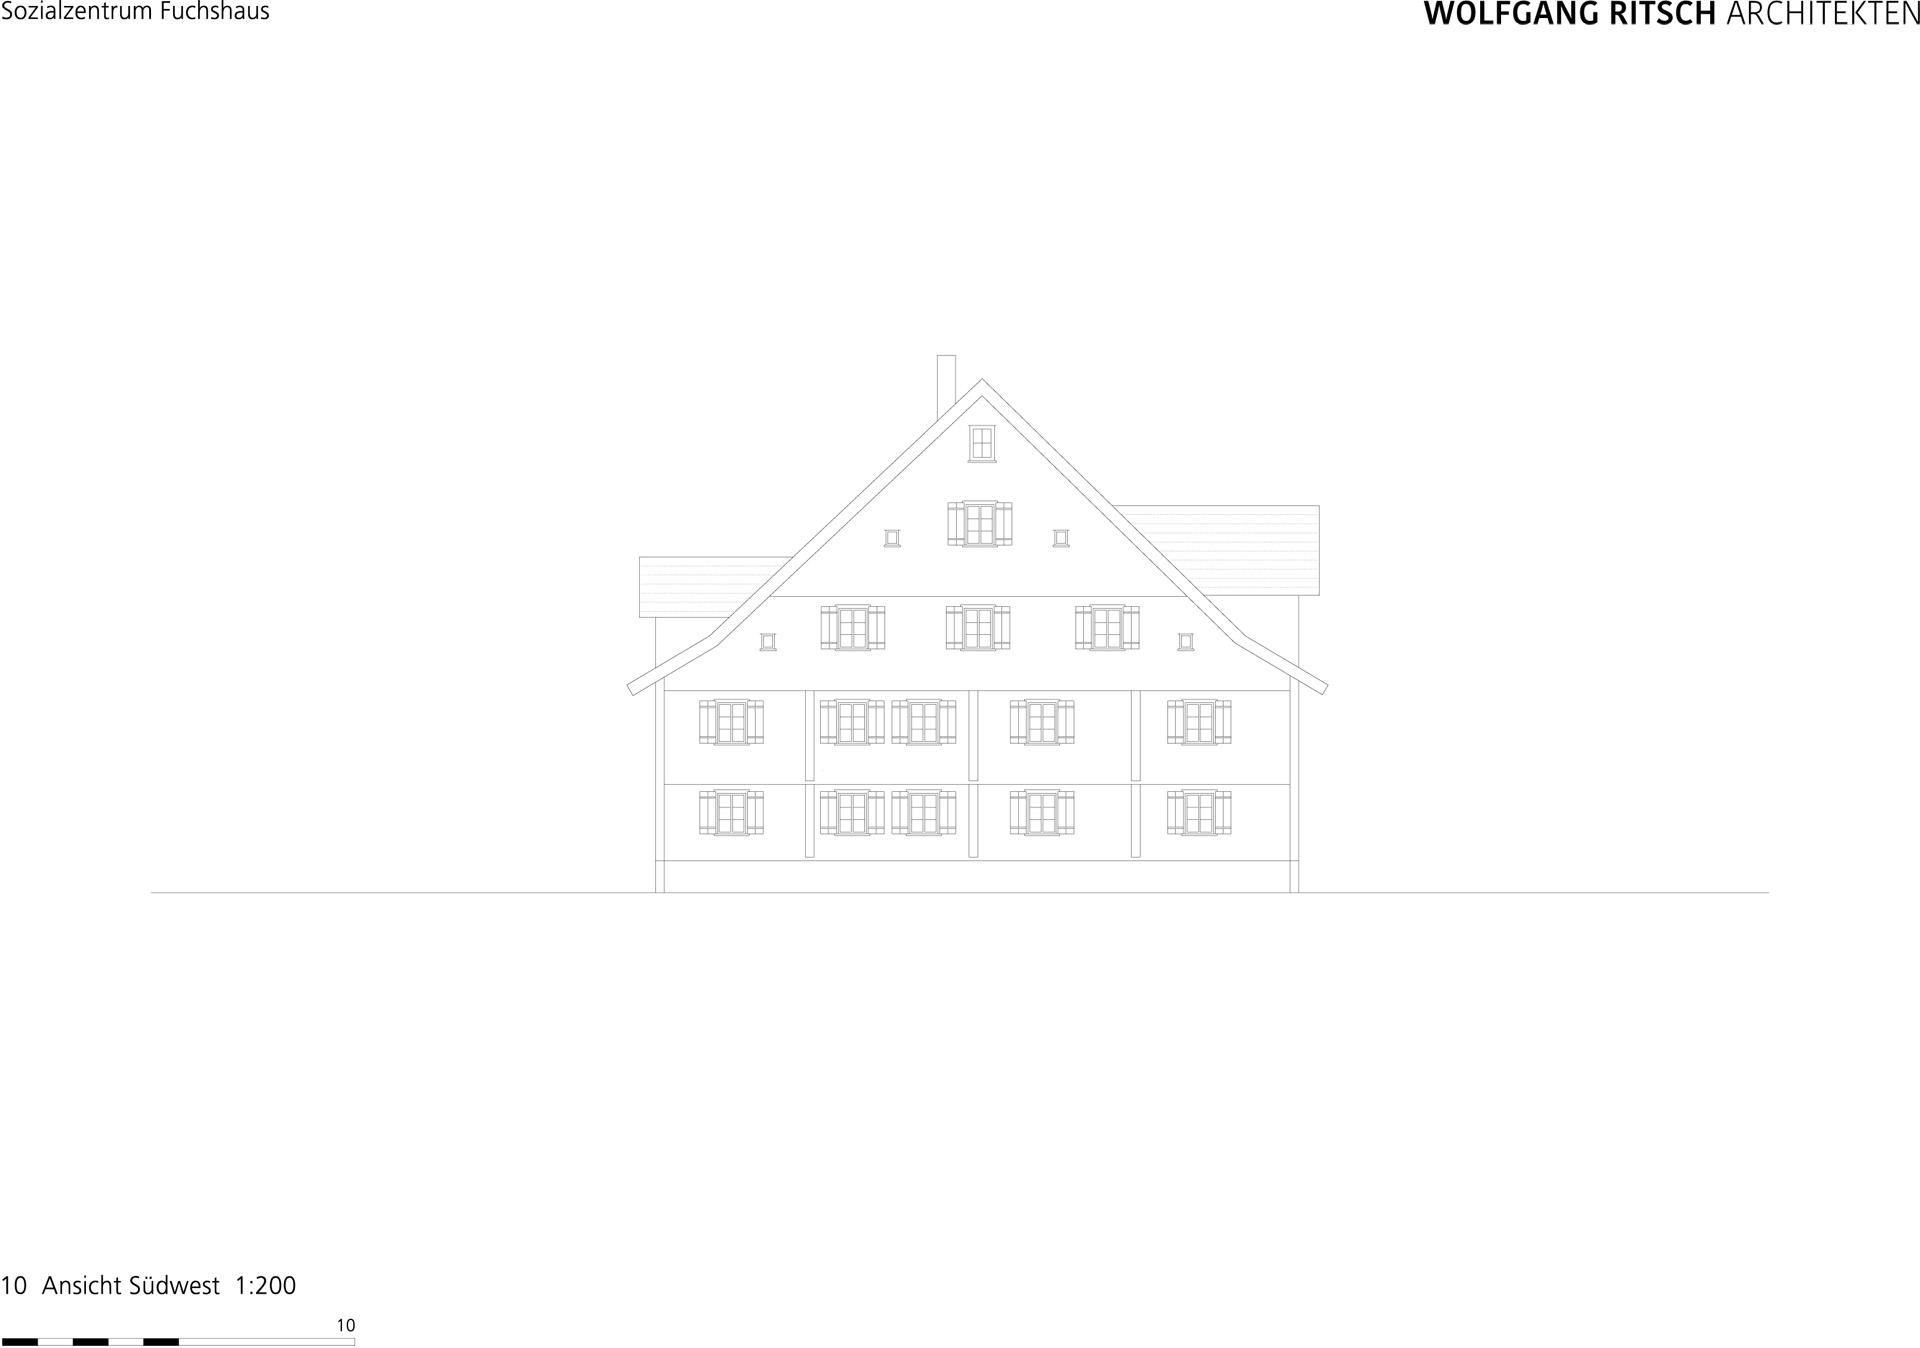 X:PROJEKTE70002750 Fuchshaus2-PUBLIPLAN20-dwg921_AN S.dwes